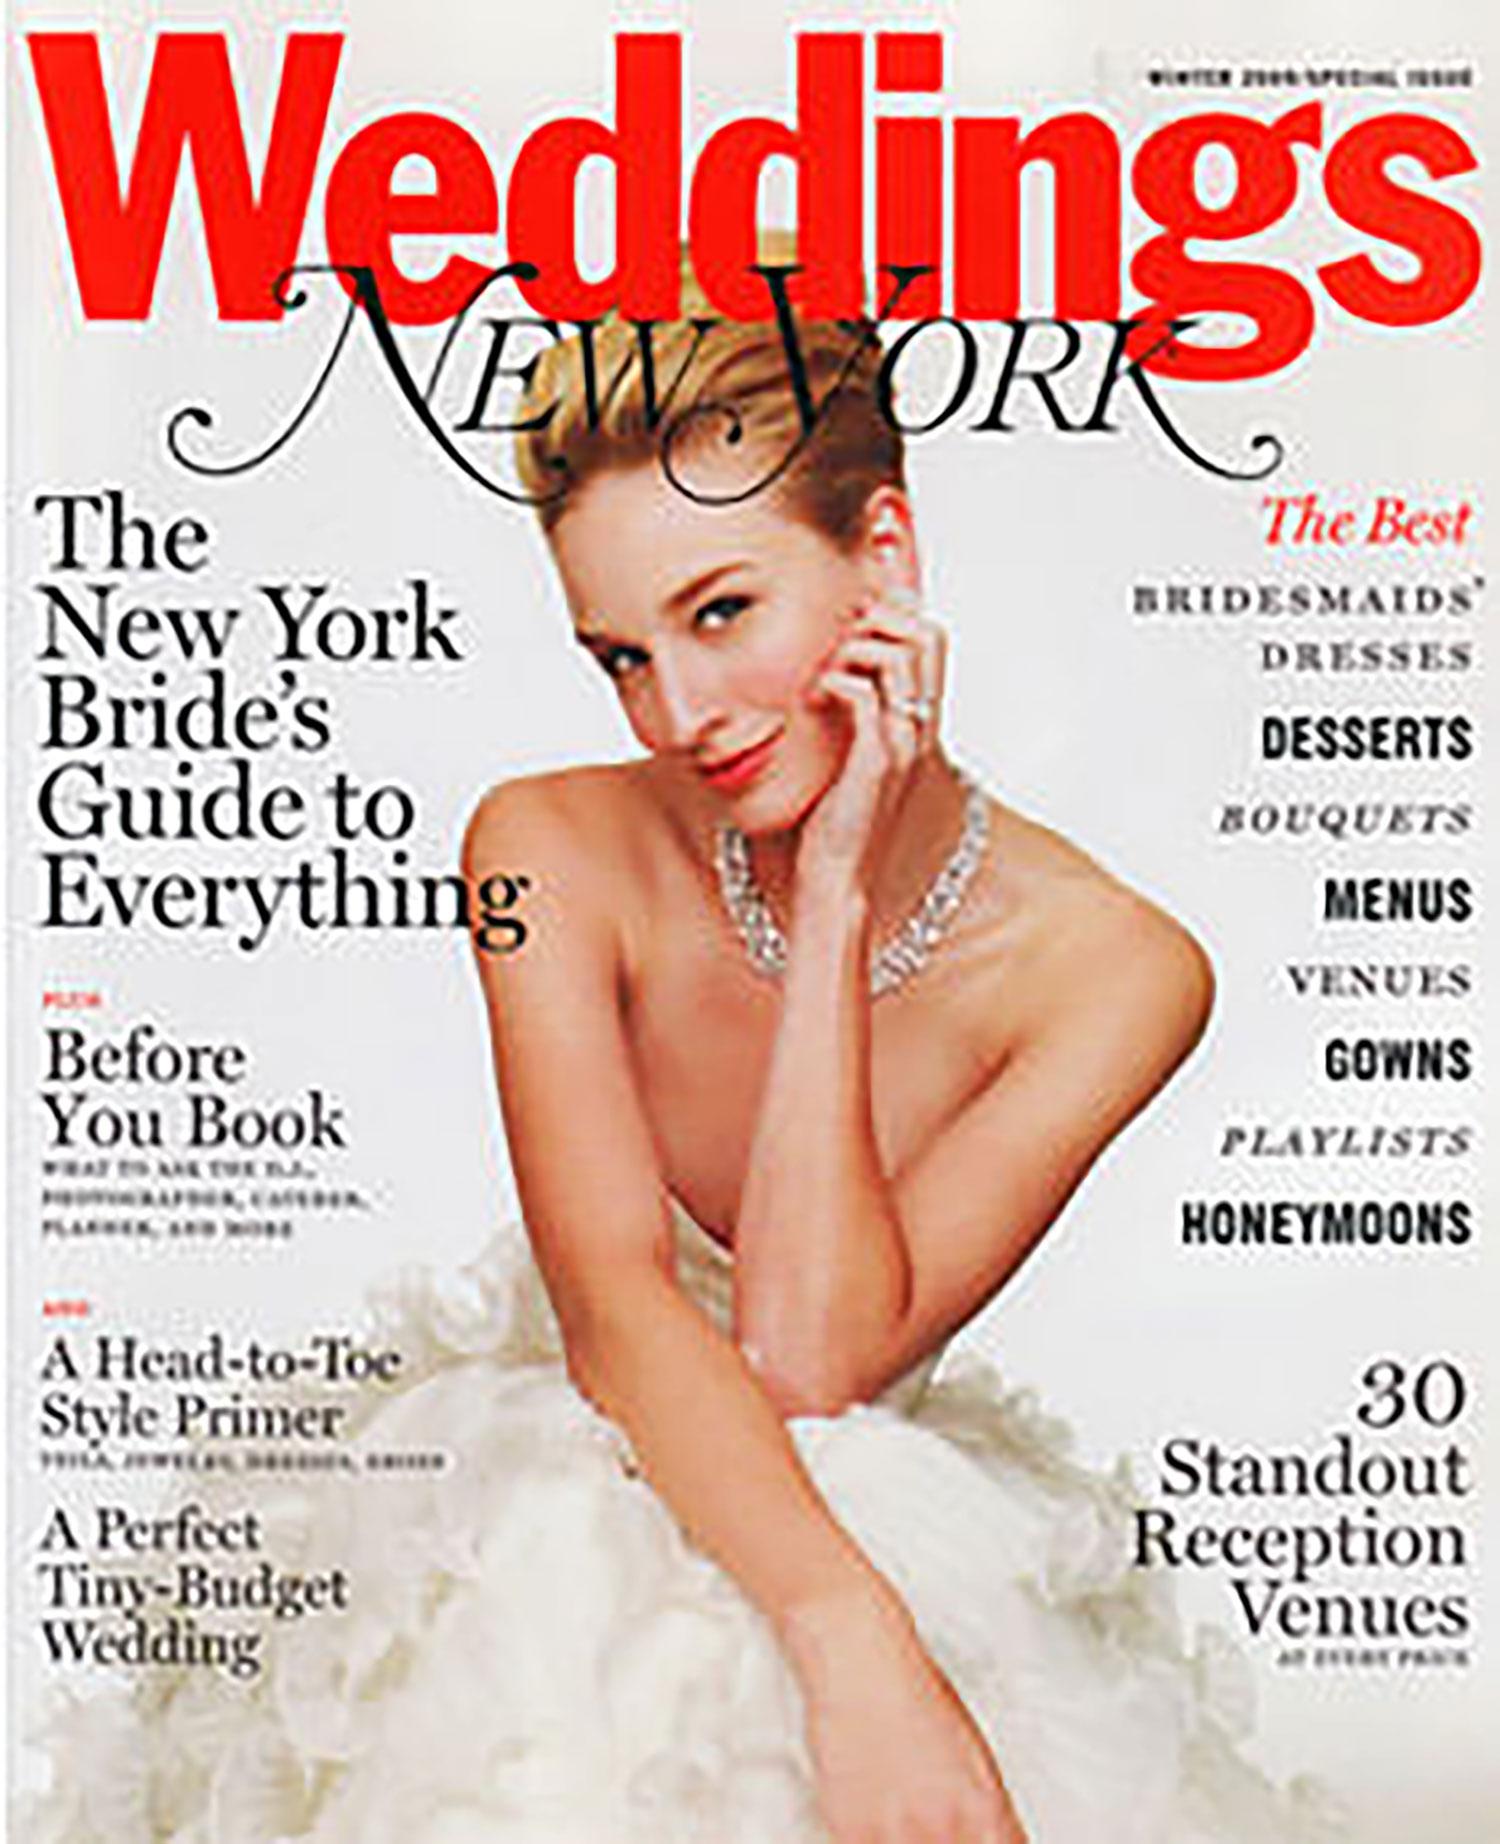 NY-Magazine-Weddings-Top-Ten-NYC.jpg